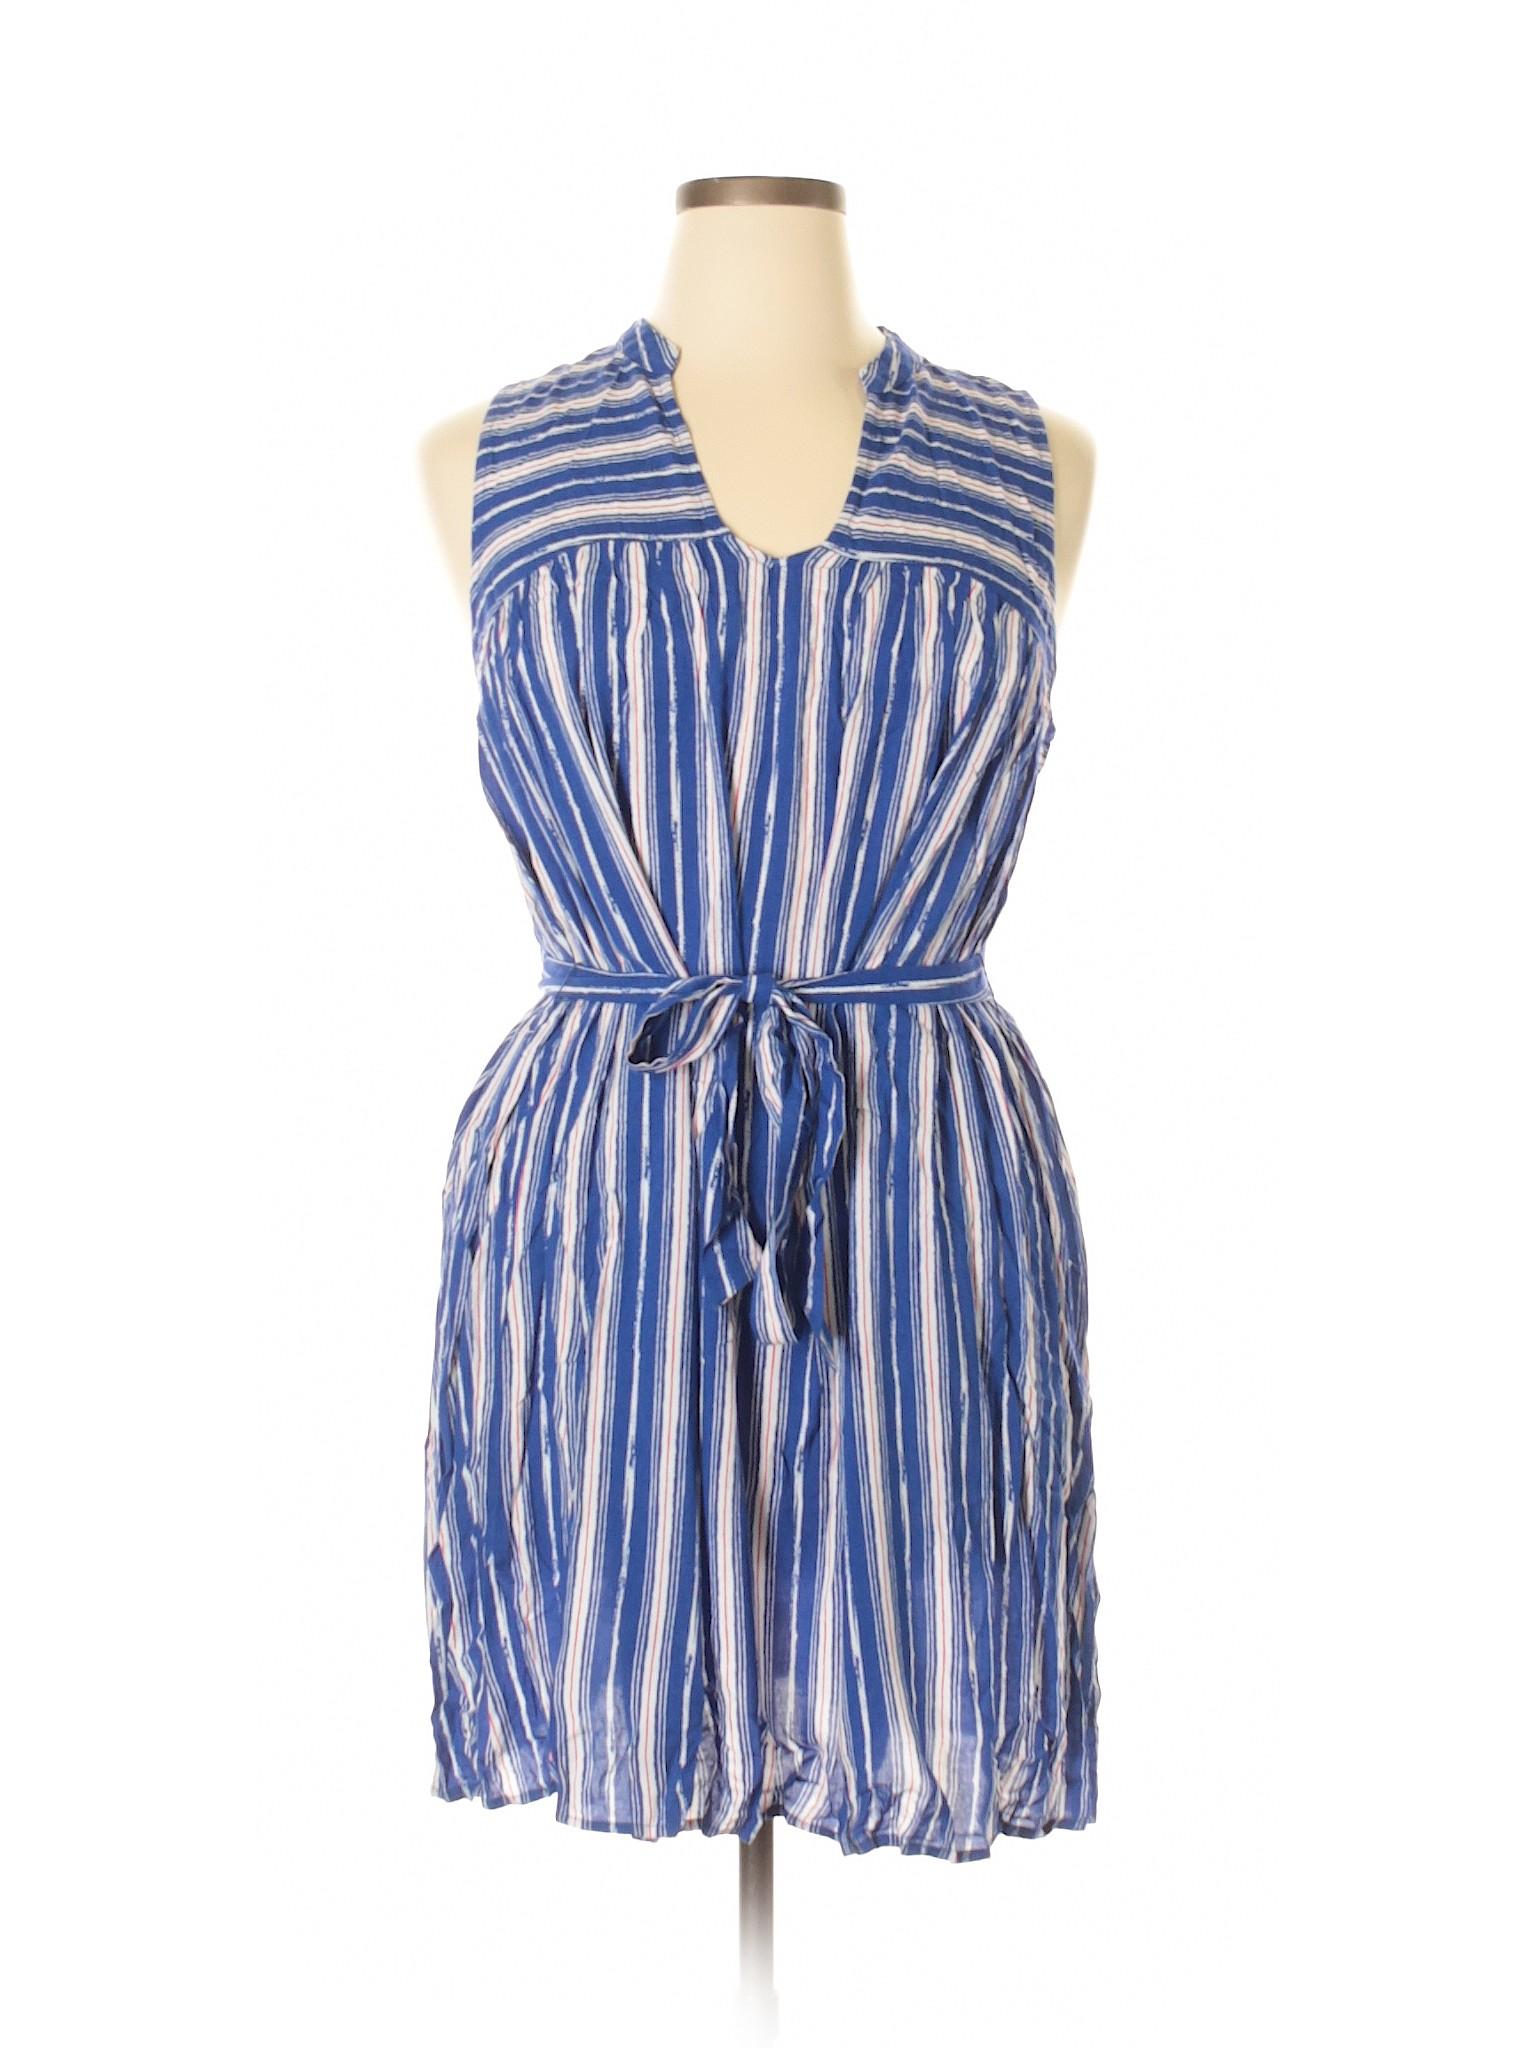 Casual Dress Forever Boutique 21 winter 8wCwxz